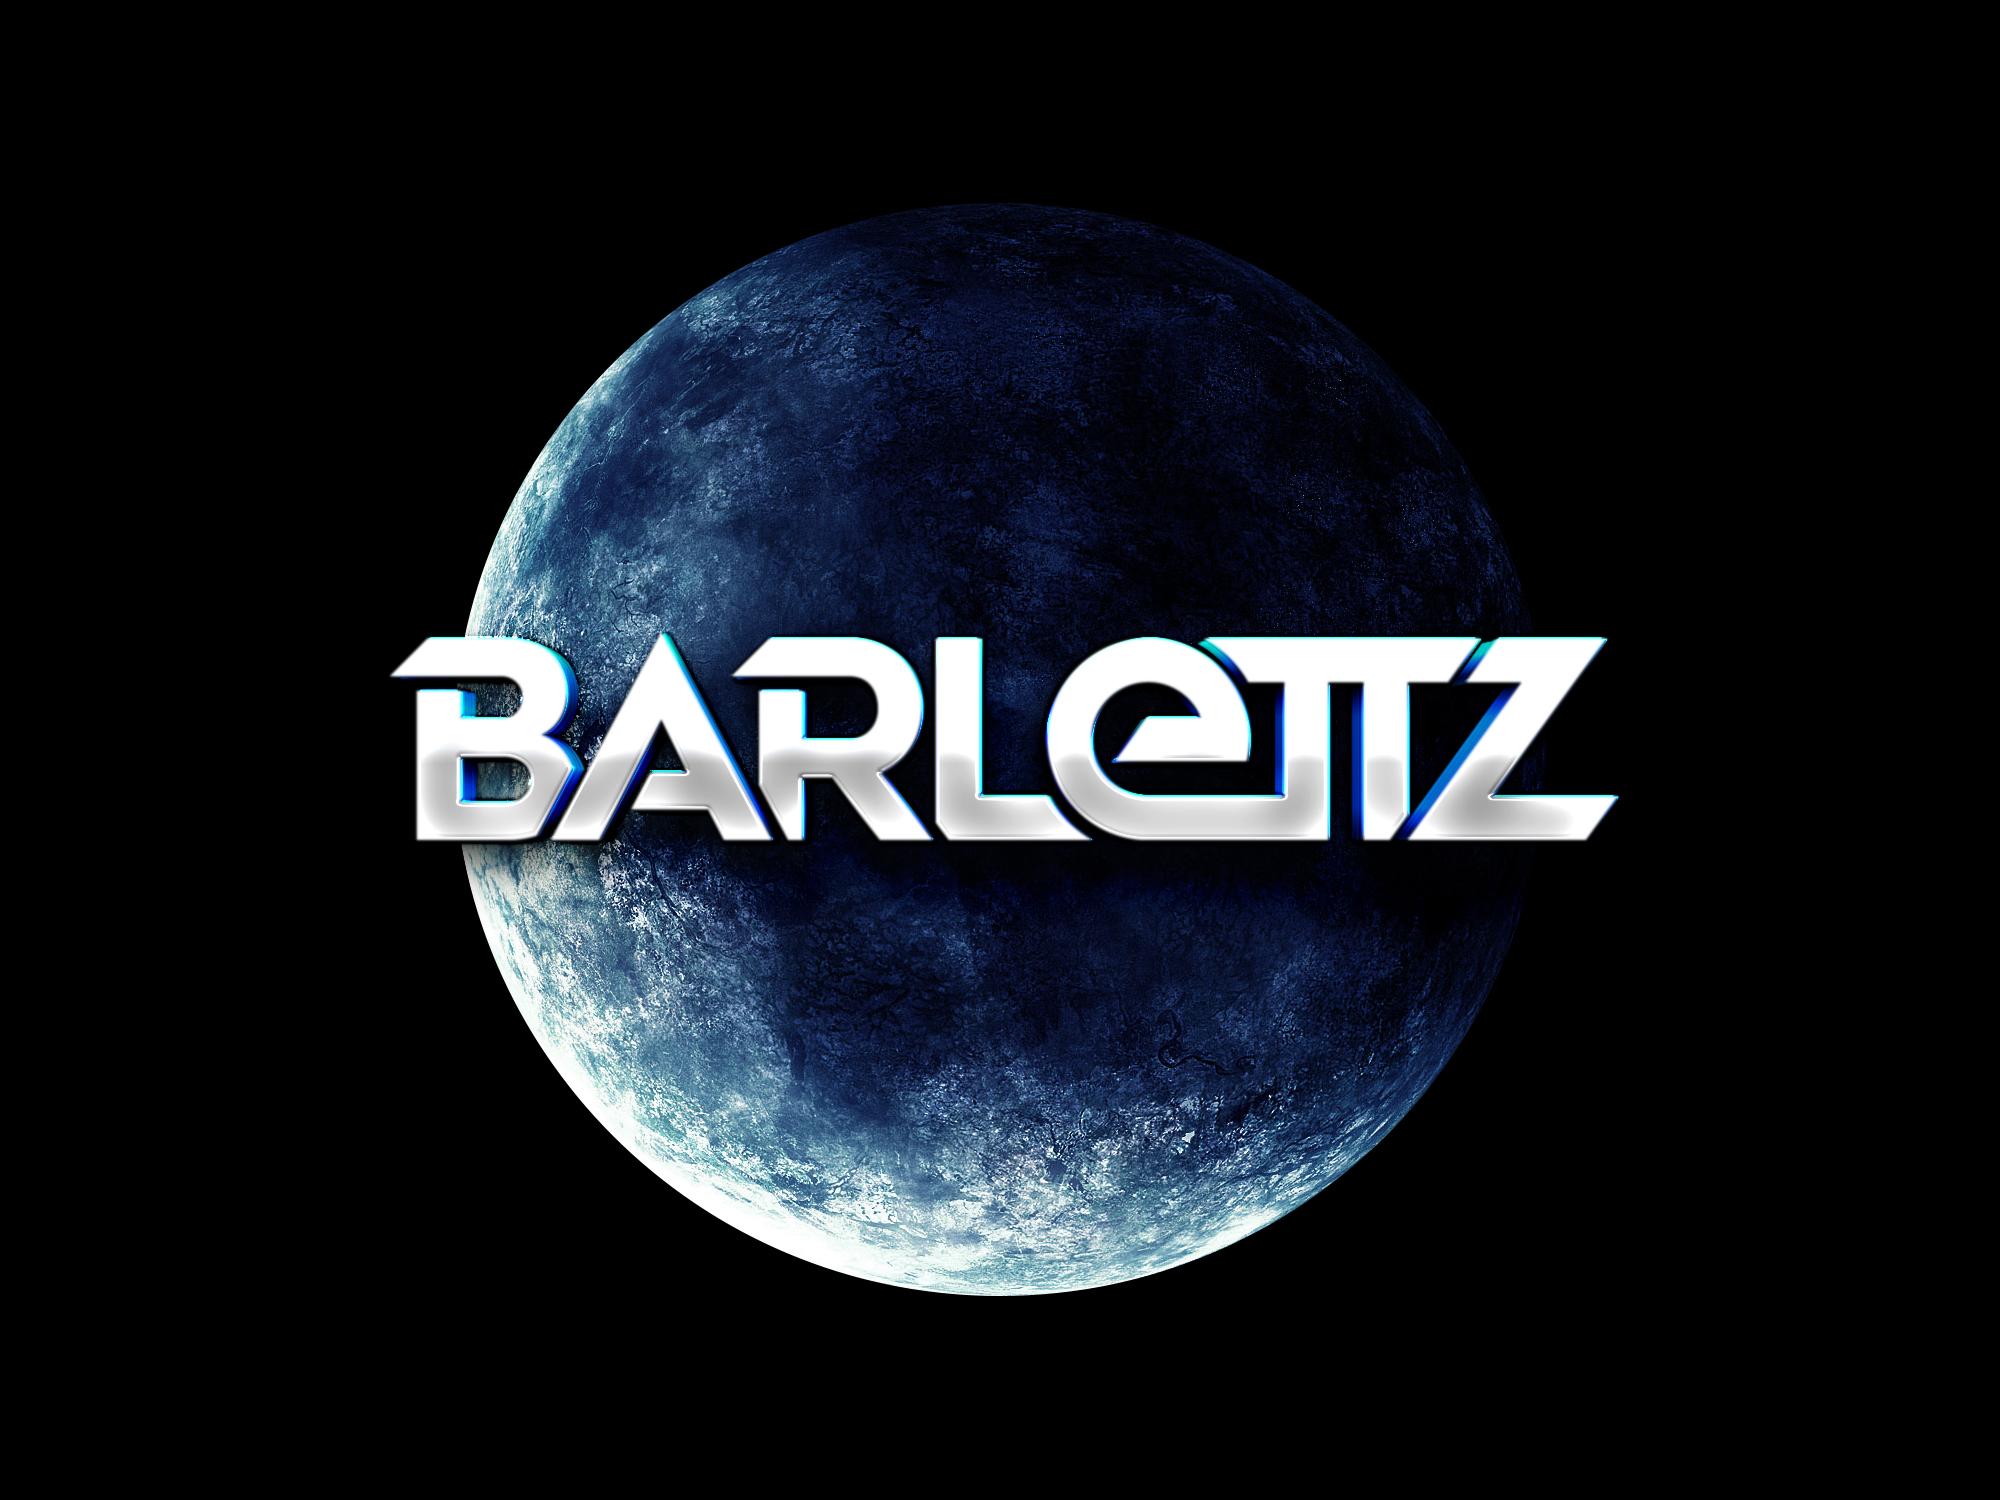 Barlettz